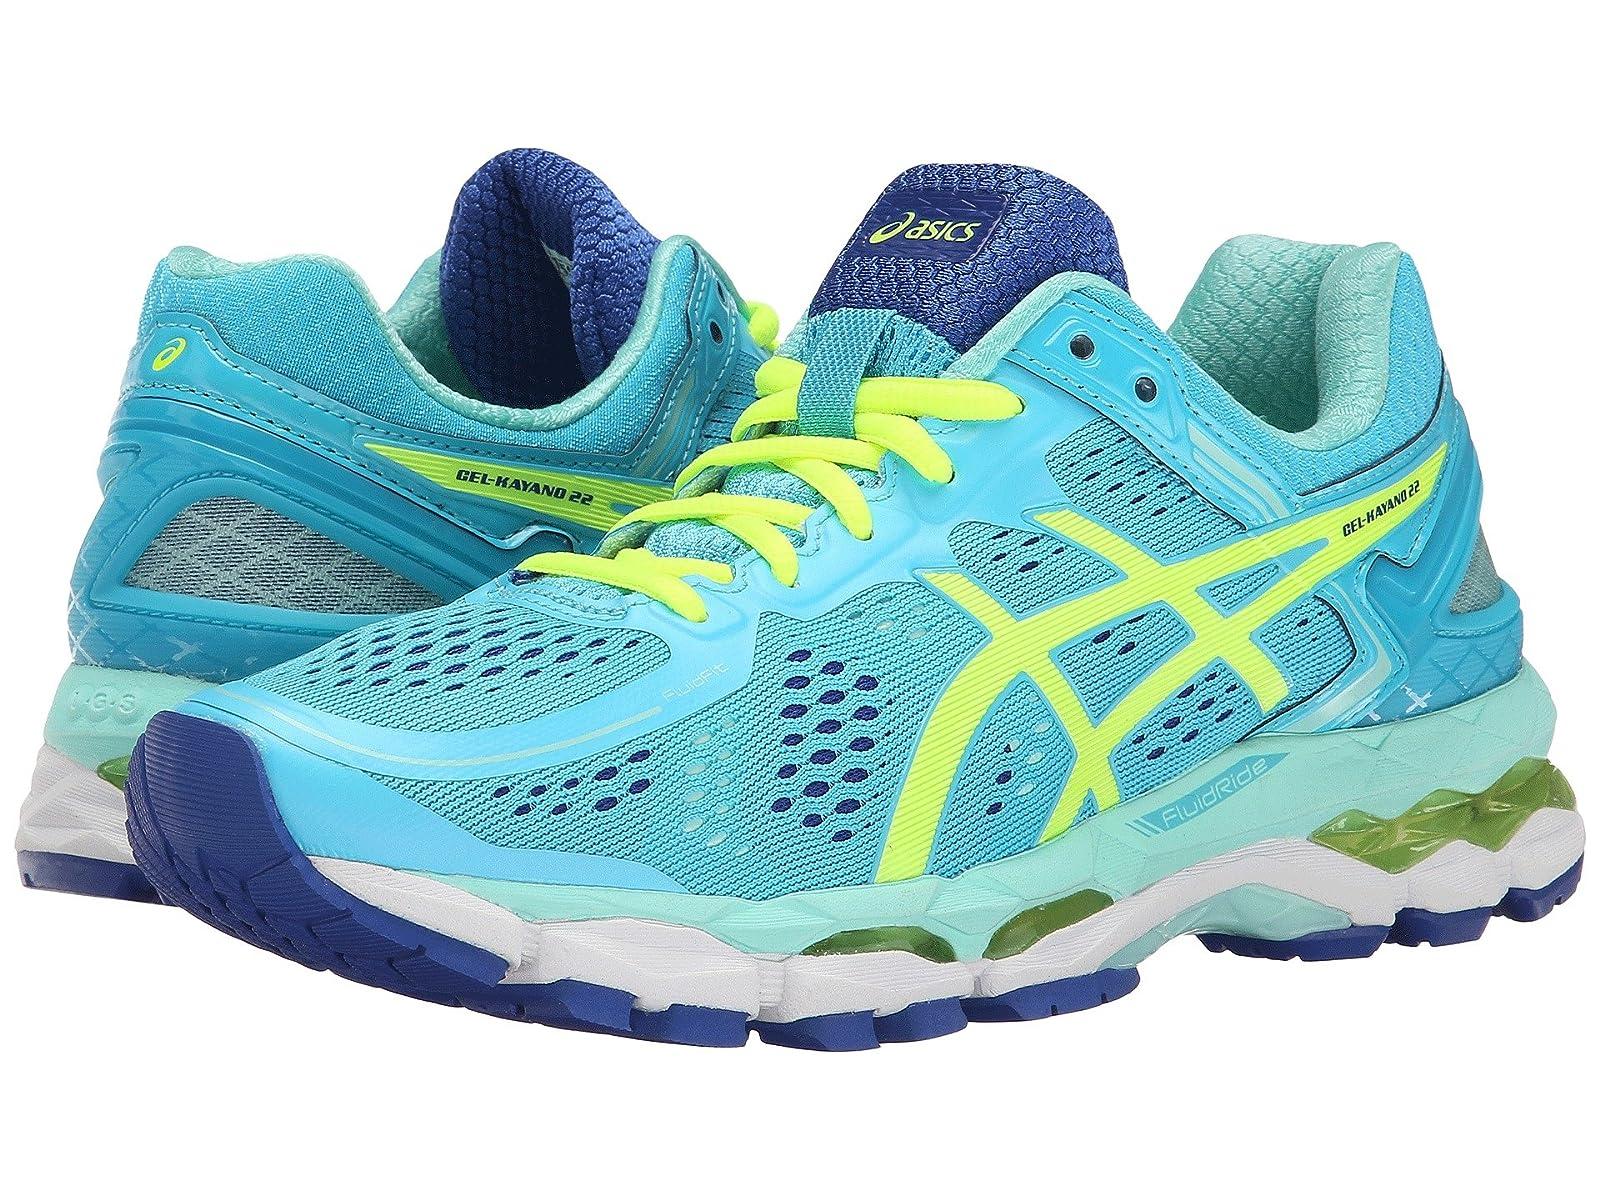 ASICS GEL-Kayano® 22Cheap and distinctive eye-catching shoes